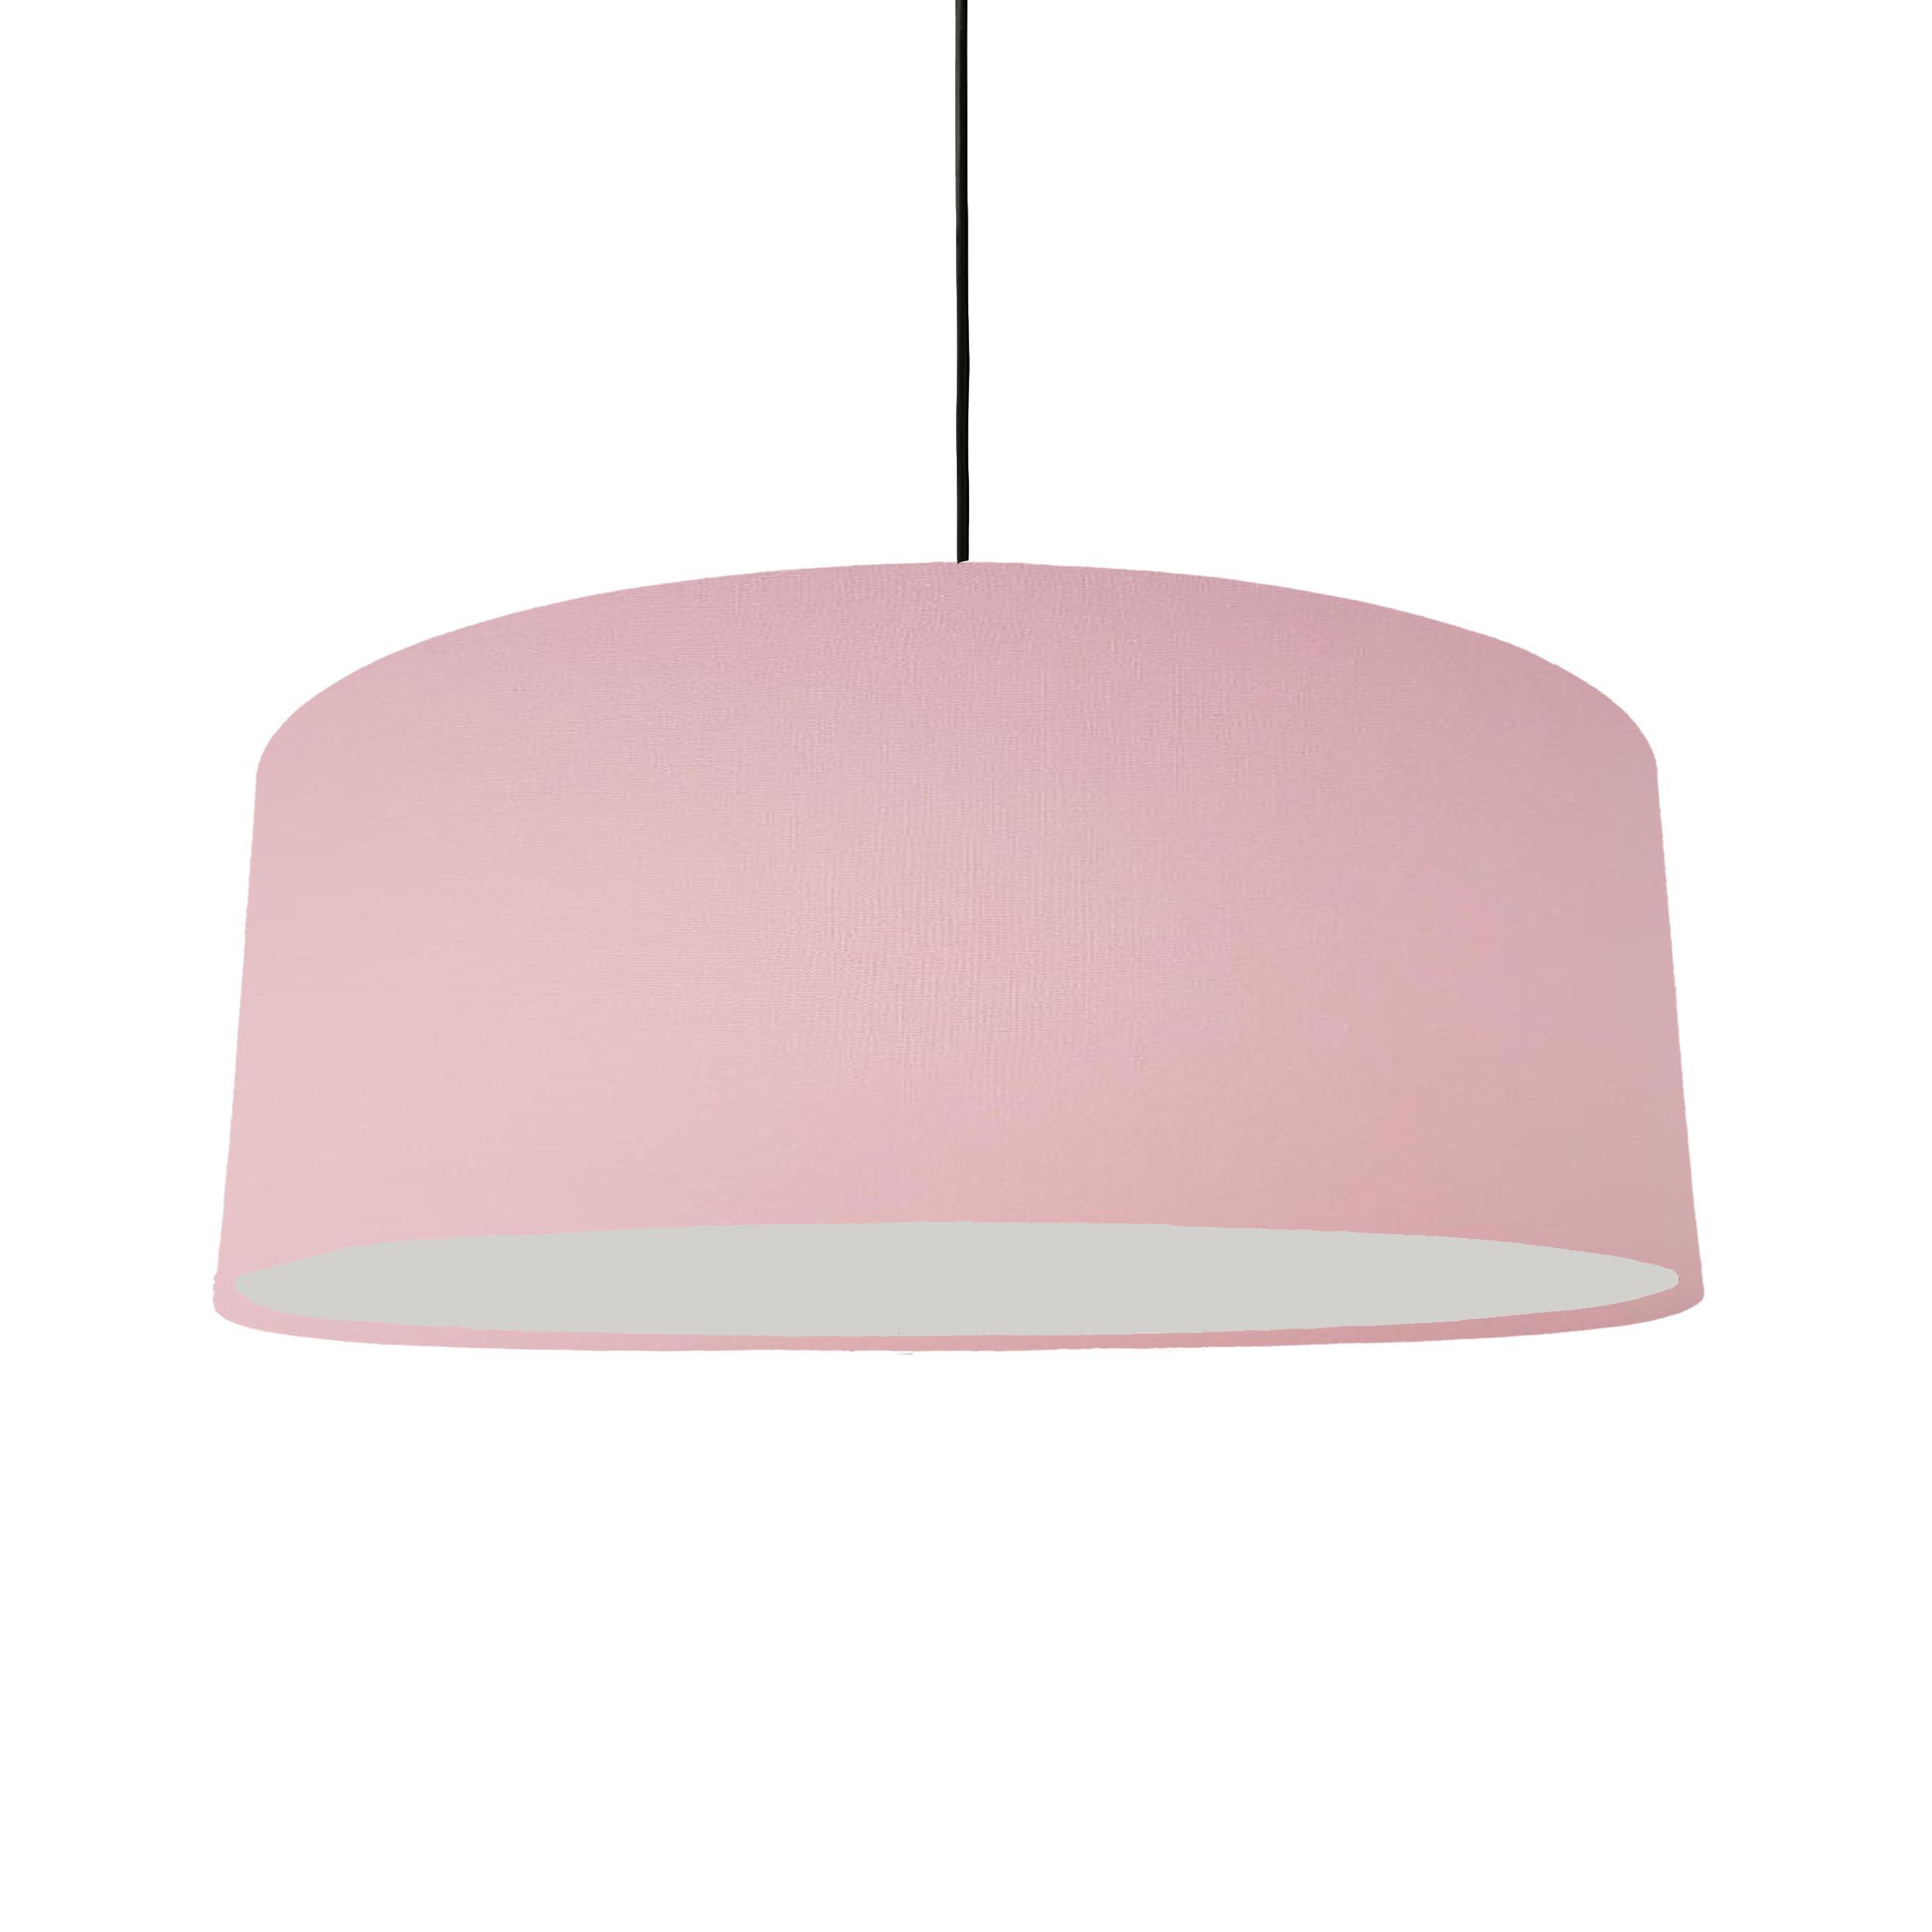 Extra Large Light Pink Cotton Hanging Lampshade